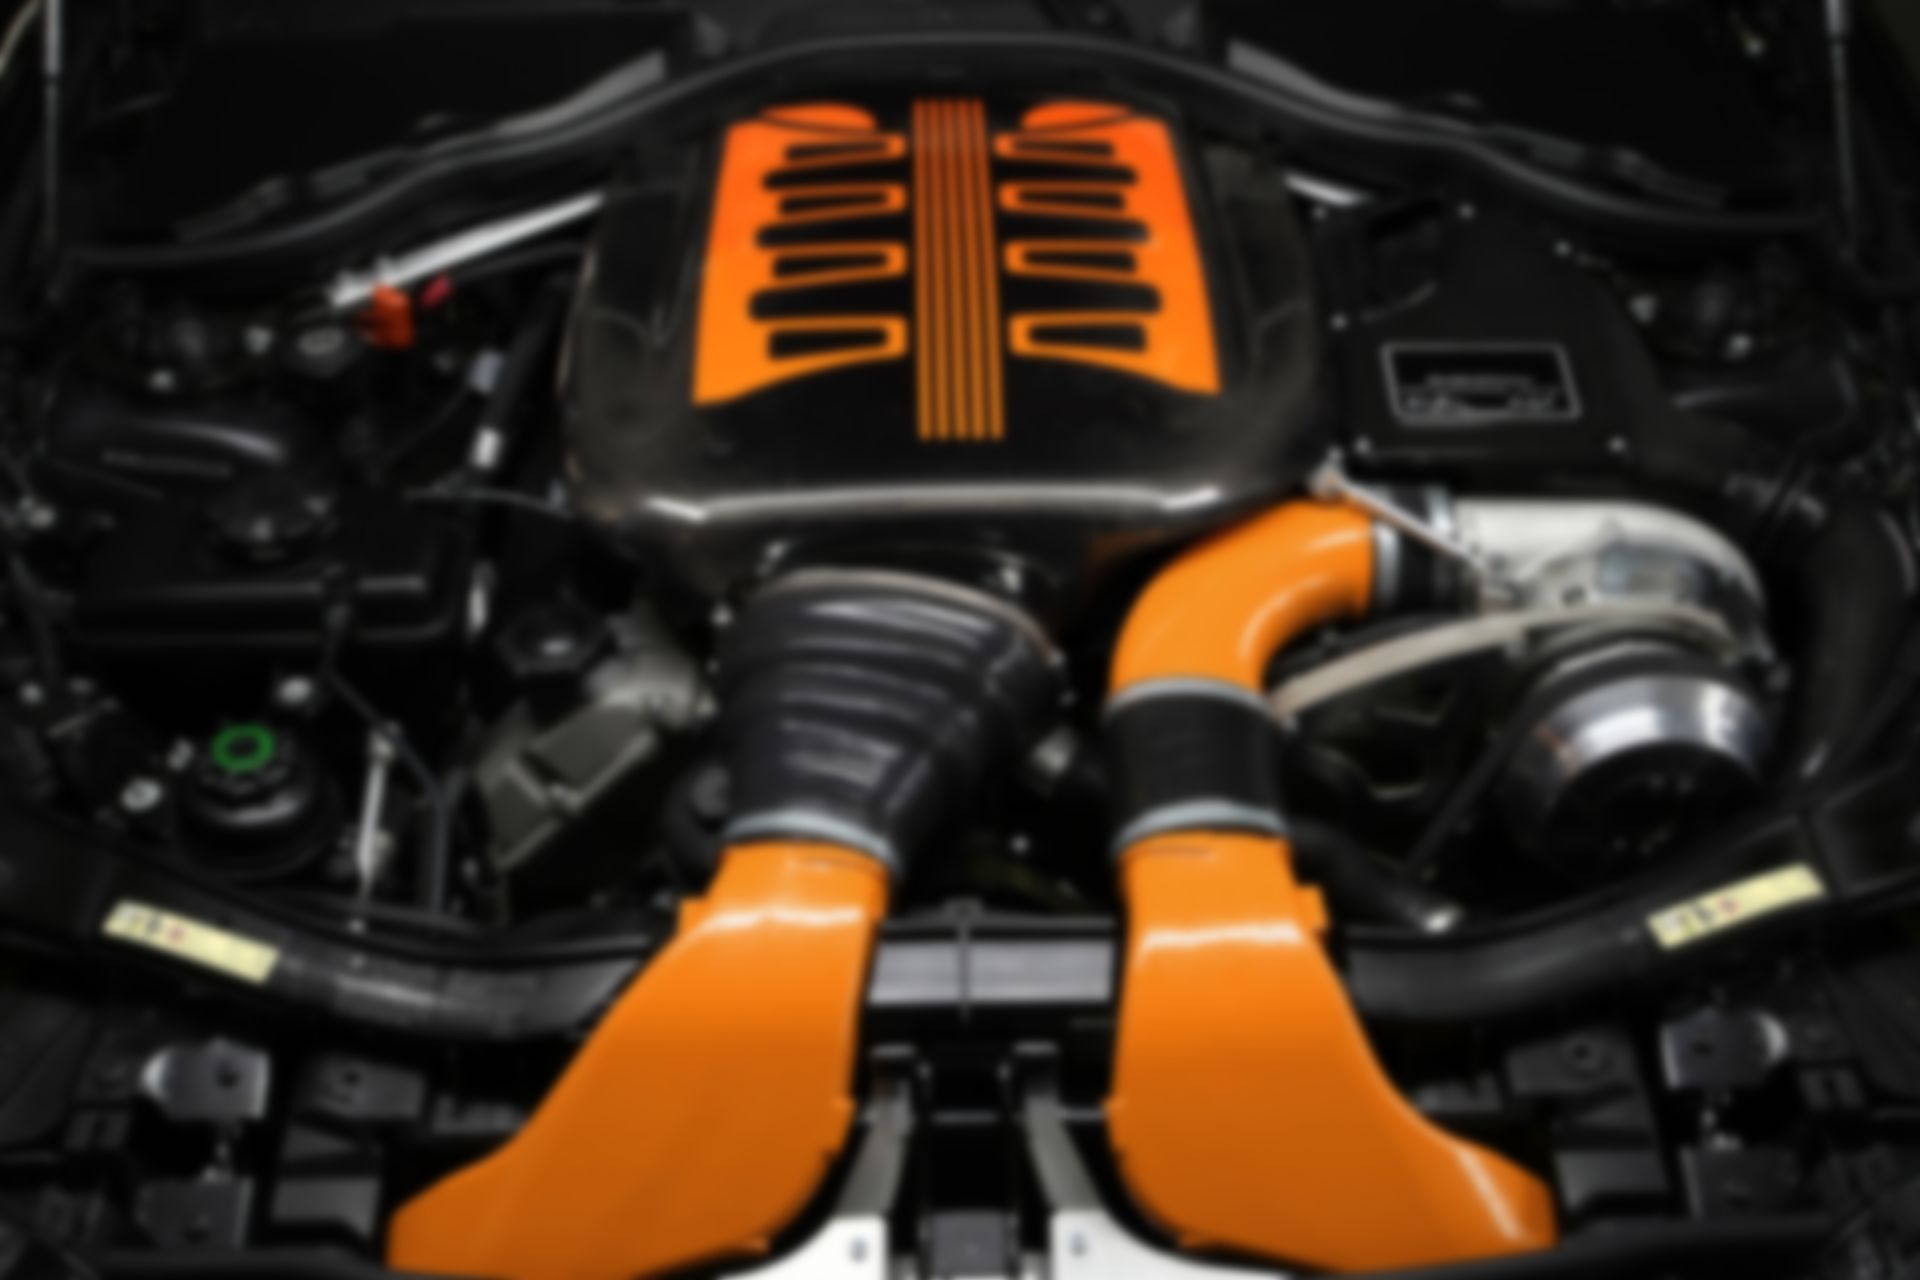 2011_G_Power_BMW_M_3_Tornado_R_S_tuning_engine_engines_3888x2592